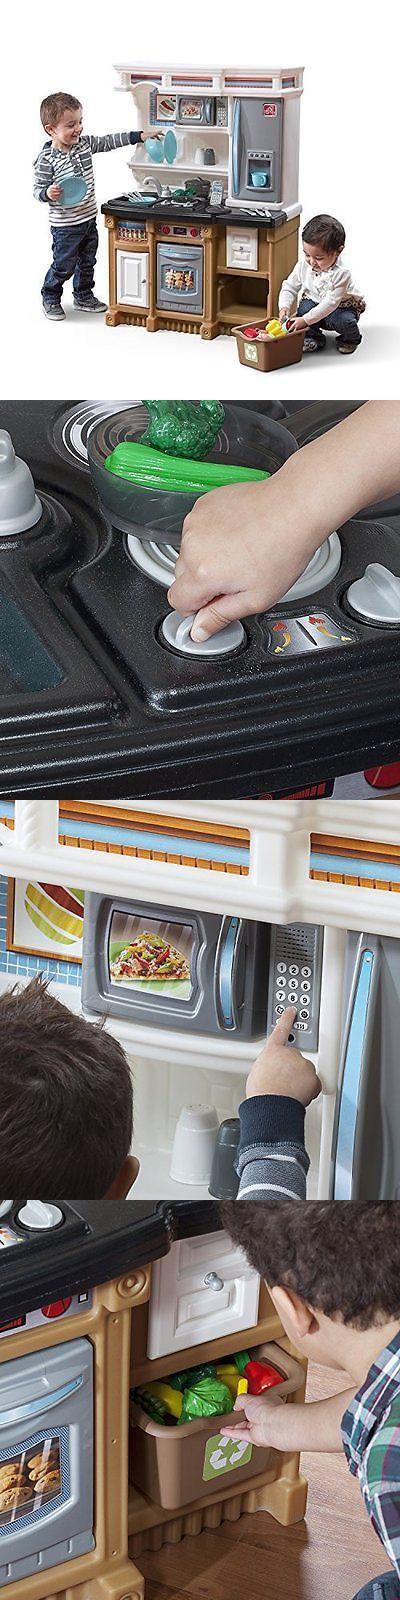 Kitchens 158746: Step2 Lifestyle Custom Kitchen Playset New -> BUY IT NOW ONLY: $94.69 on eBay!